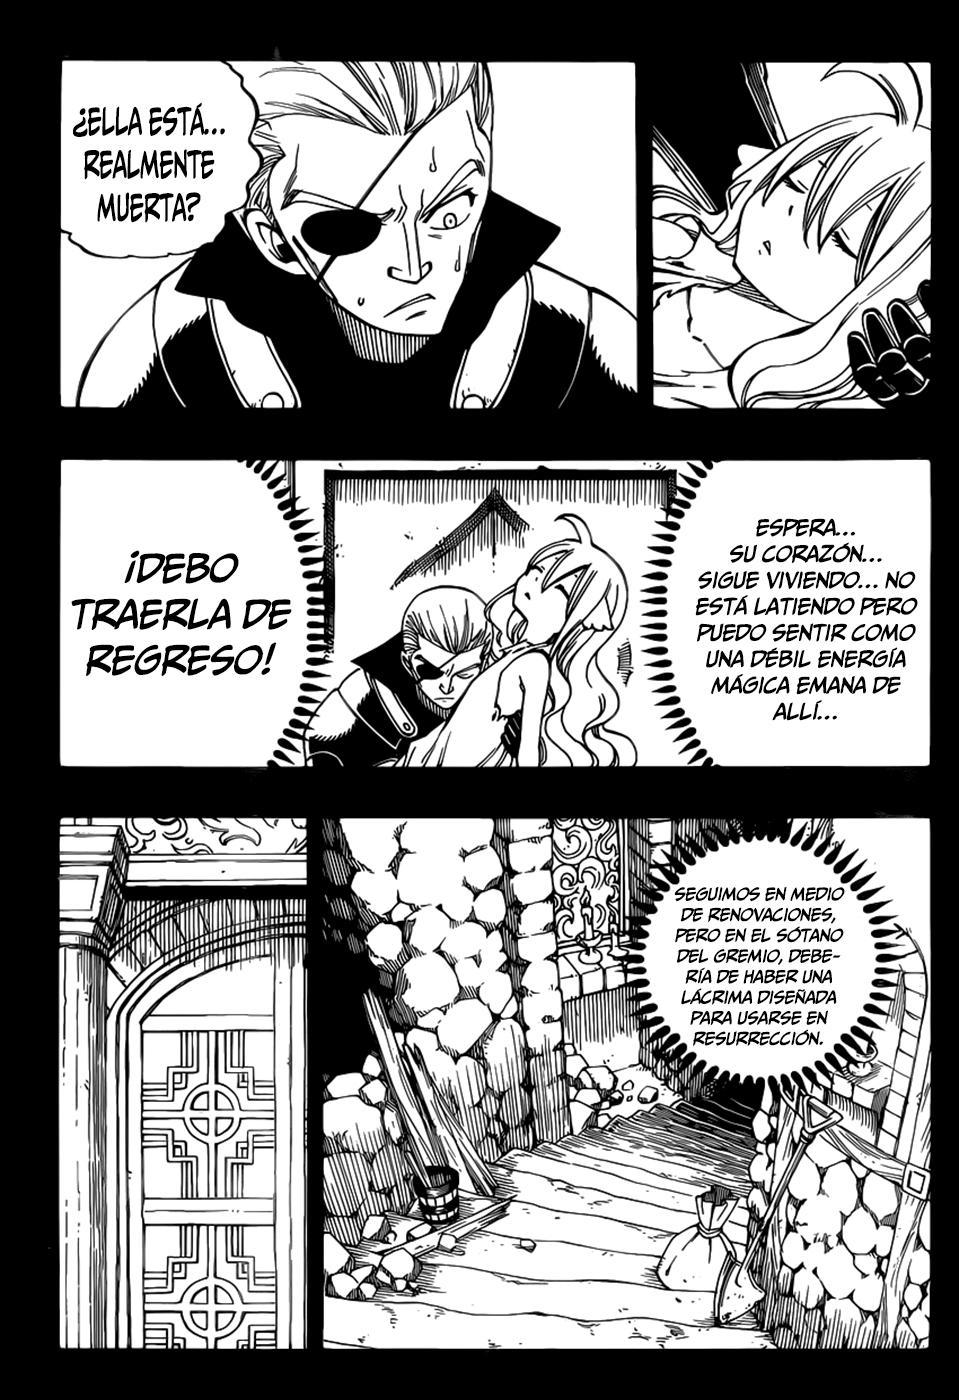 http://c5.ninemanga.com/es_manga/14/78/415515/080aa4b023fd3788e13b0aabb6ab3e58.jpg Page 8